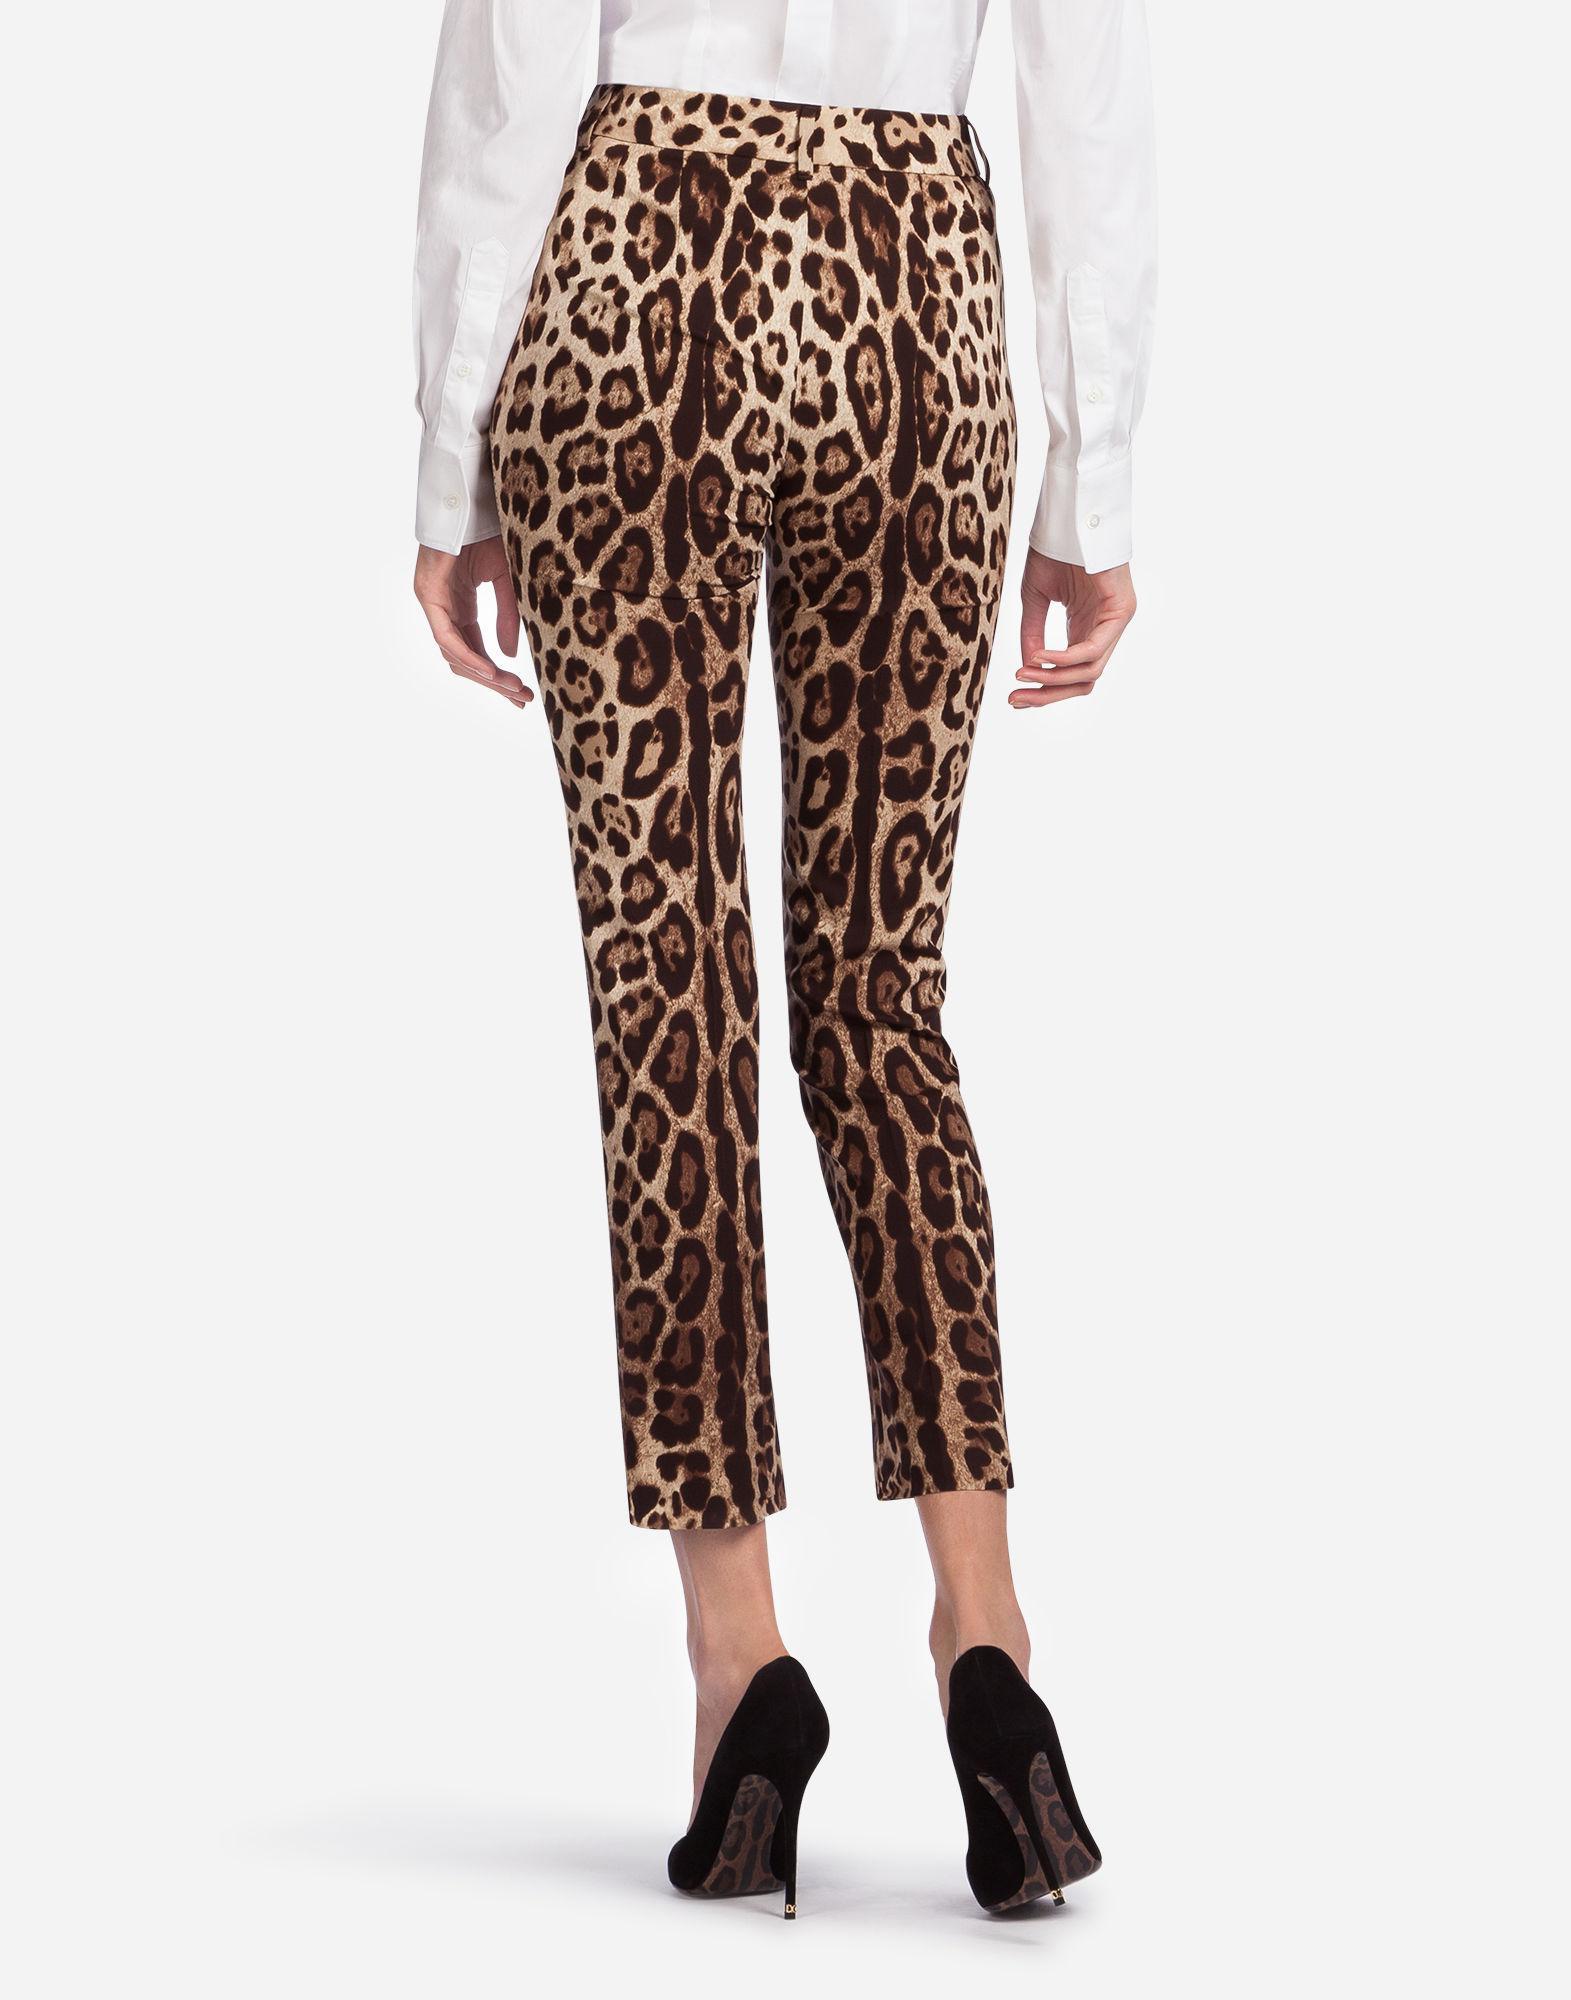 70e0540989d3 Dolce & Gabbana Leopard Print Cady Pants - Lyst